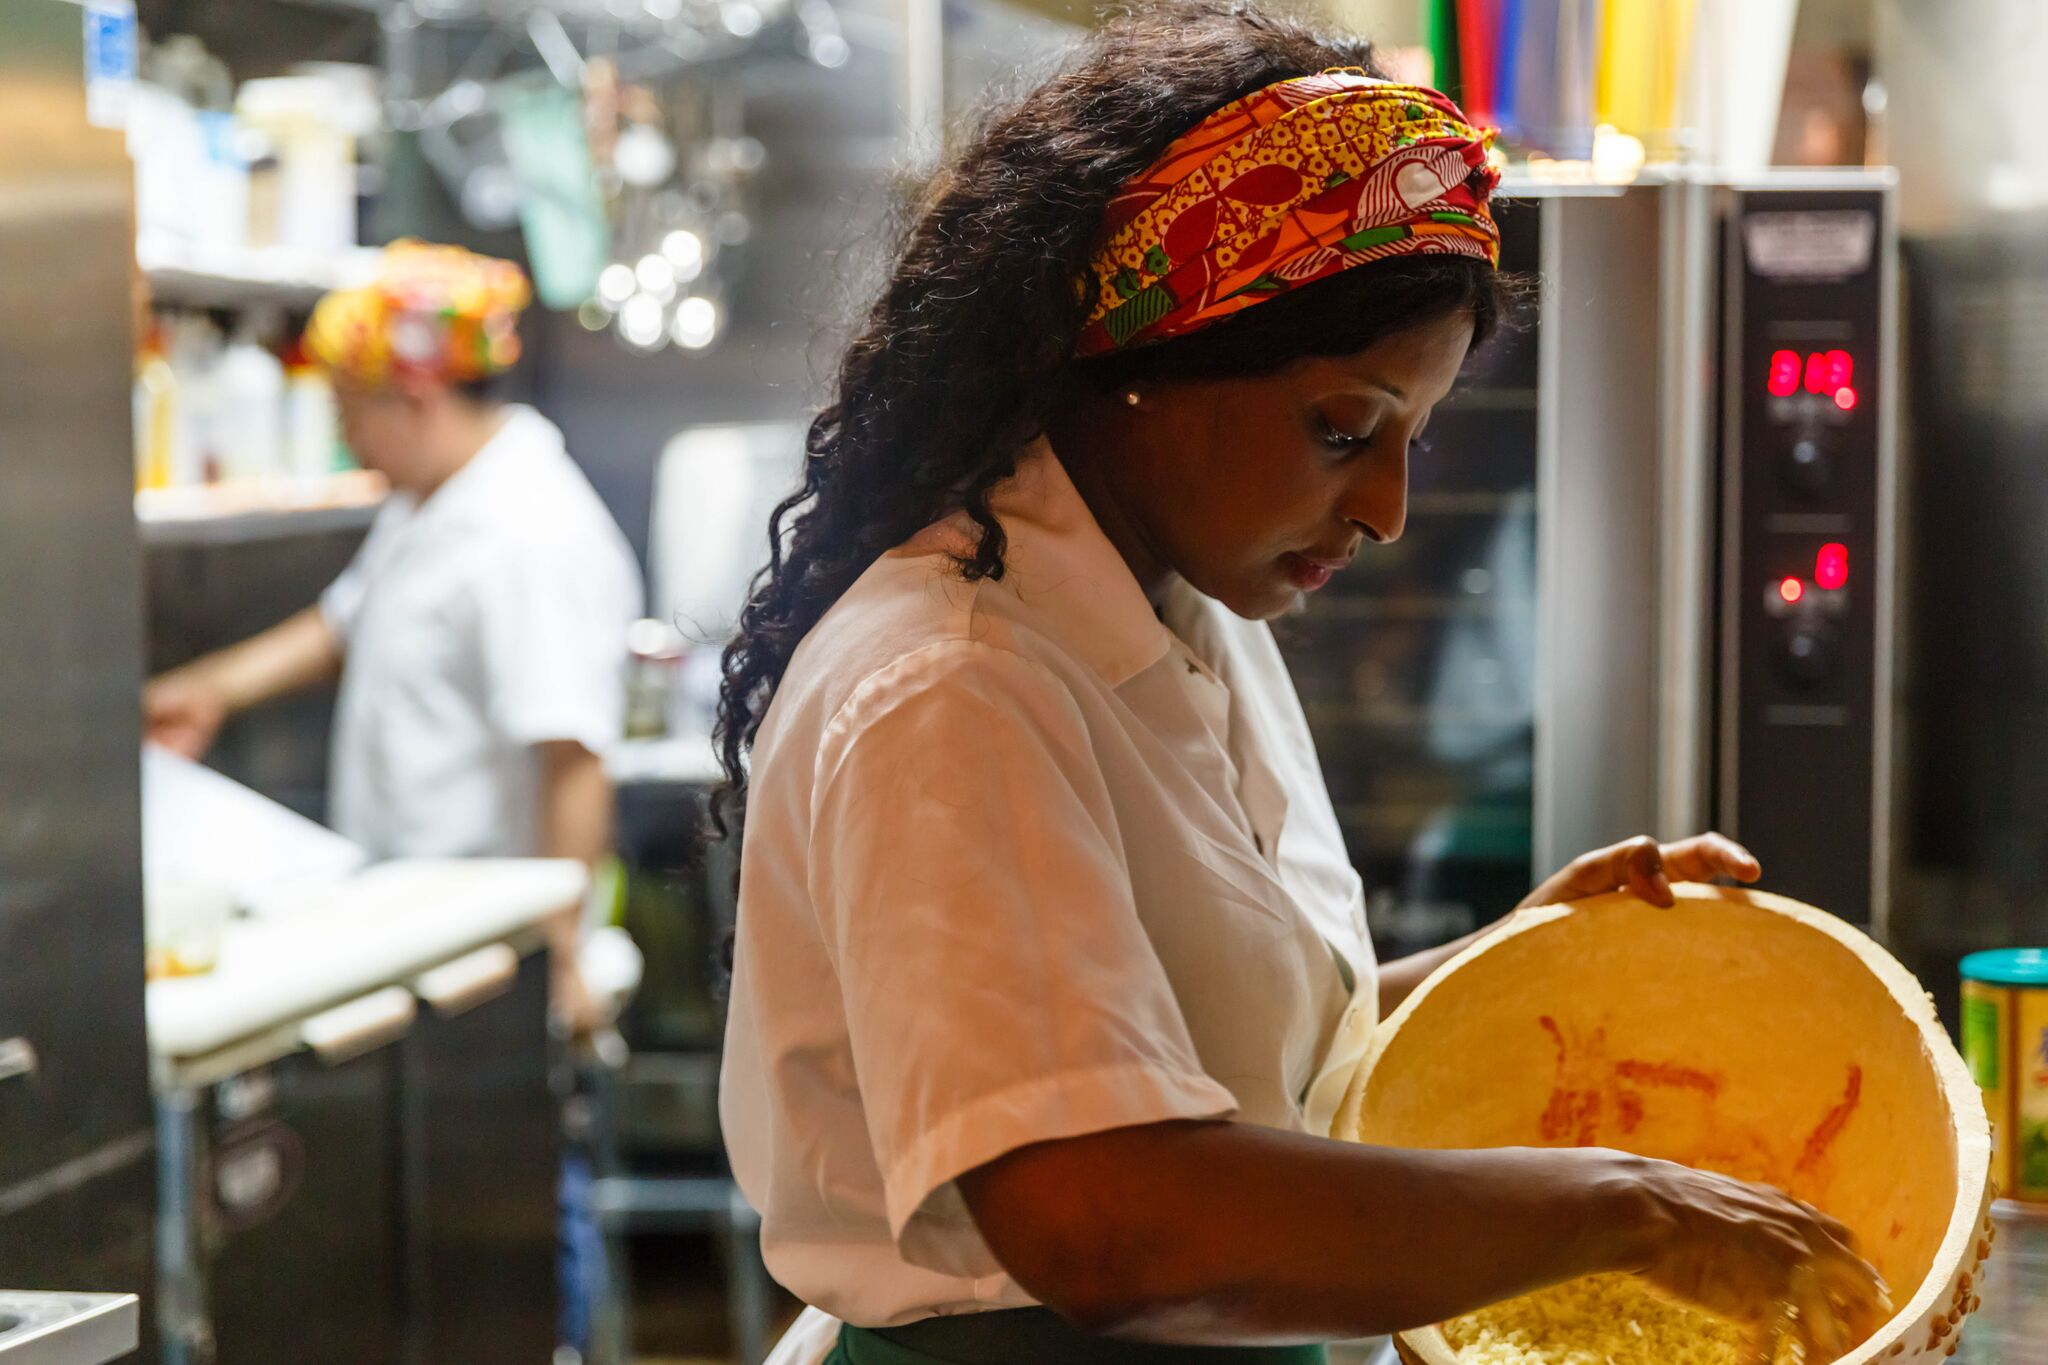 Diana Tandia at her new restaurant Berber Street Food